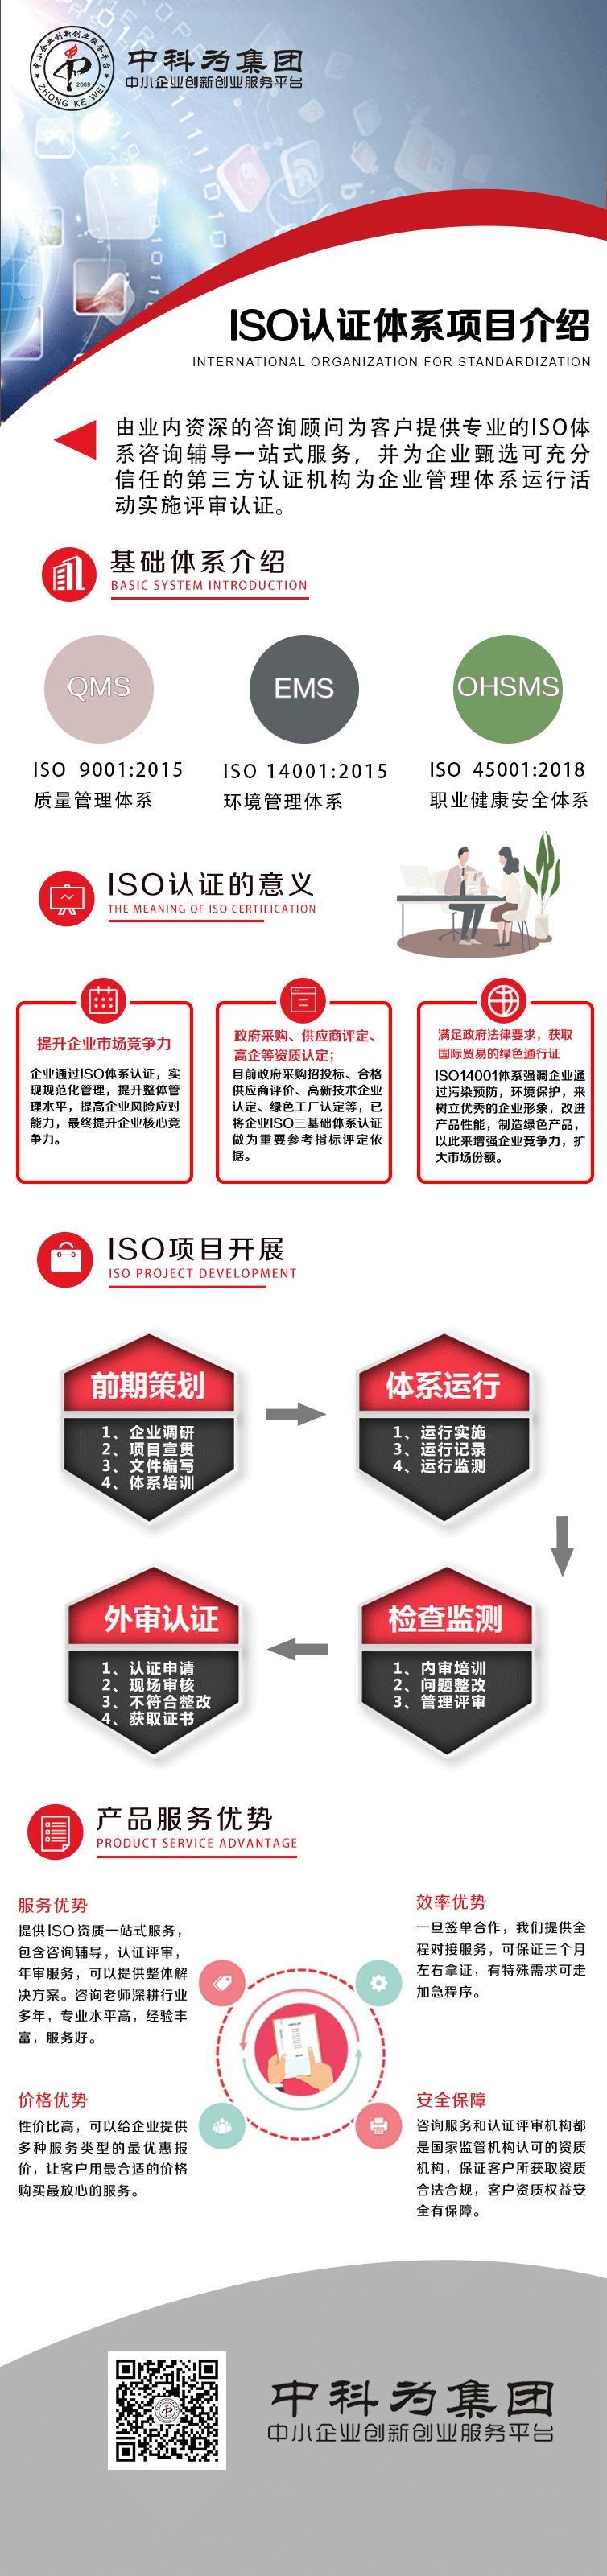 ISO认证体系项目推介-1.png